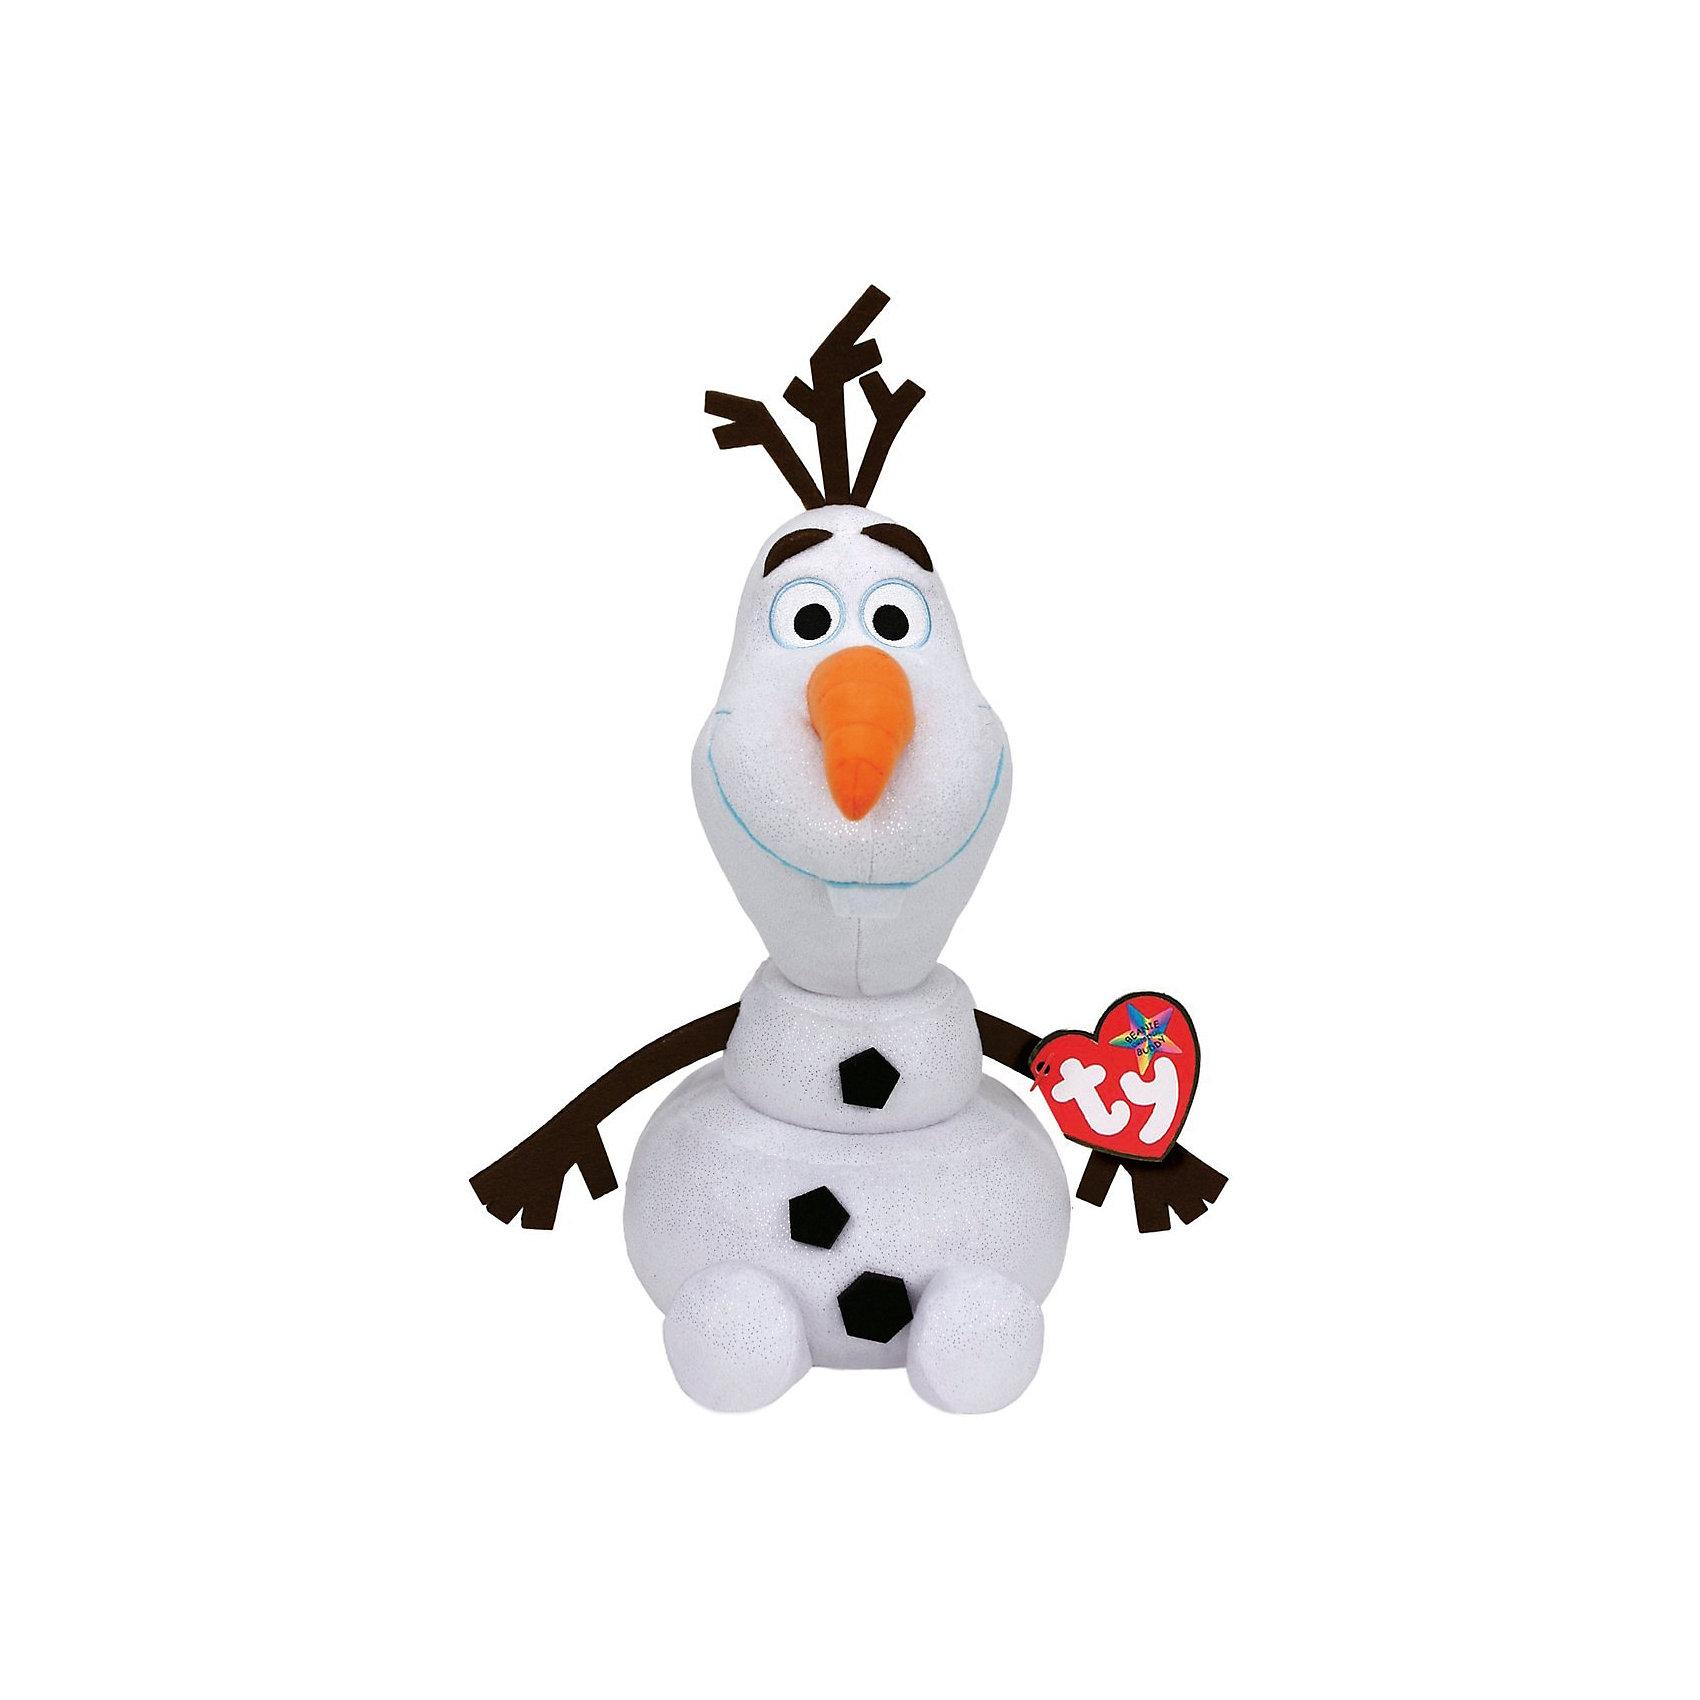 Мягкая игрушка Cнеговик Олаф, 25 см, звук, Холодное сердце, Disney Beanie Babies, TyDisney Beanie Babies. Cнеговик Olaf 25 см, звуковые эффекты<br><br>Ширина мм: 230<br>Глубина мм: 177<br>Высота мм: 129<br>Вес г: 189<br>Возраст от месяцев: 12<br>Возраст до месяцев: 72<br>Пол: Унисекс<br>Возраст: Детский<br>SKU: 3770792